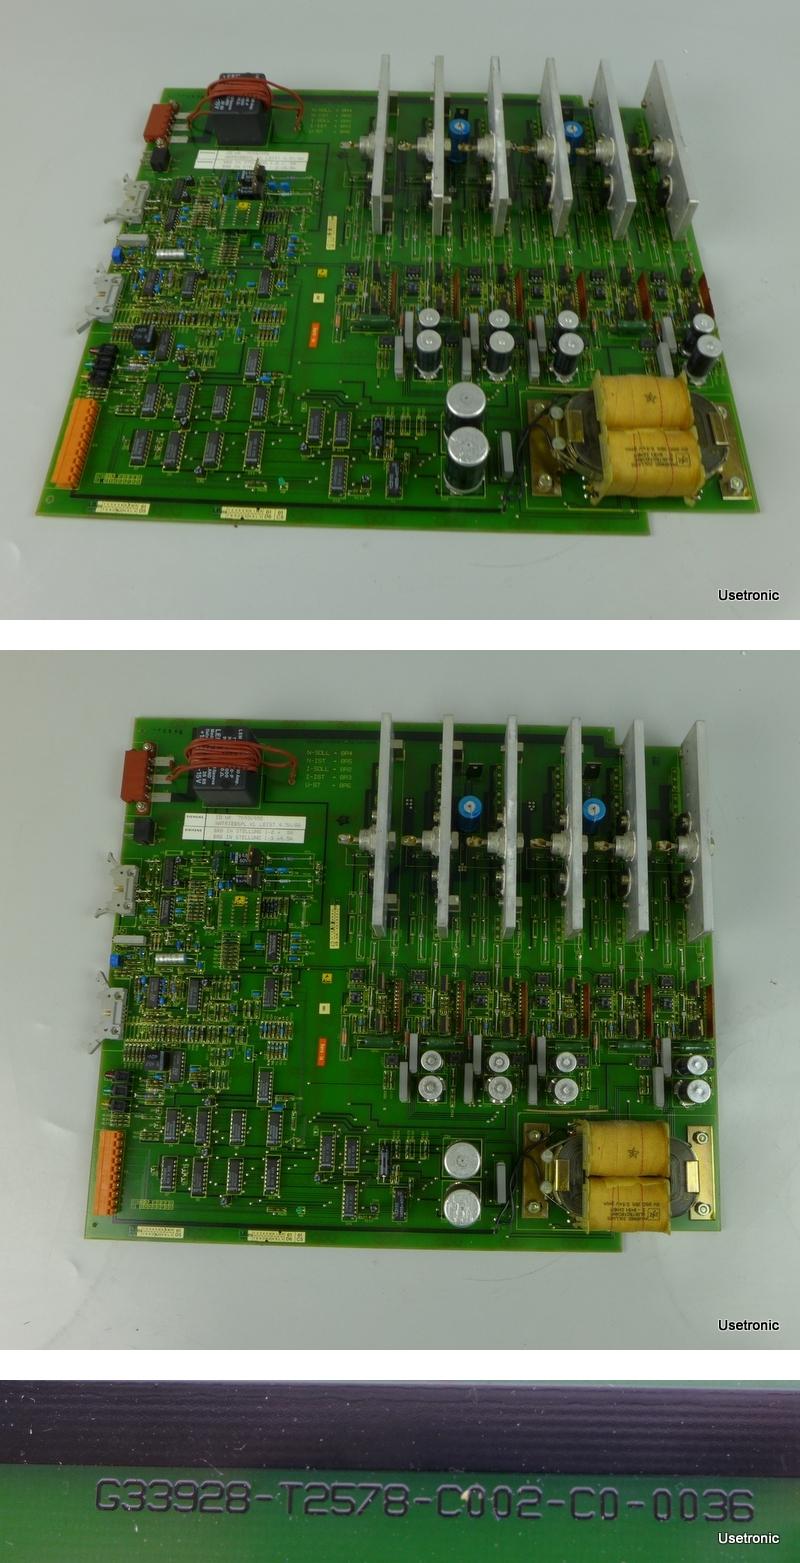 Siemens 70930958